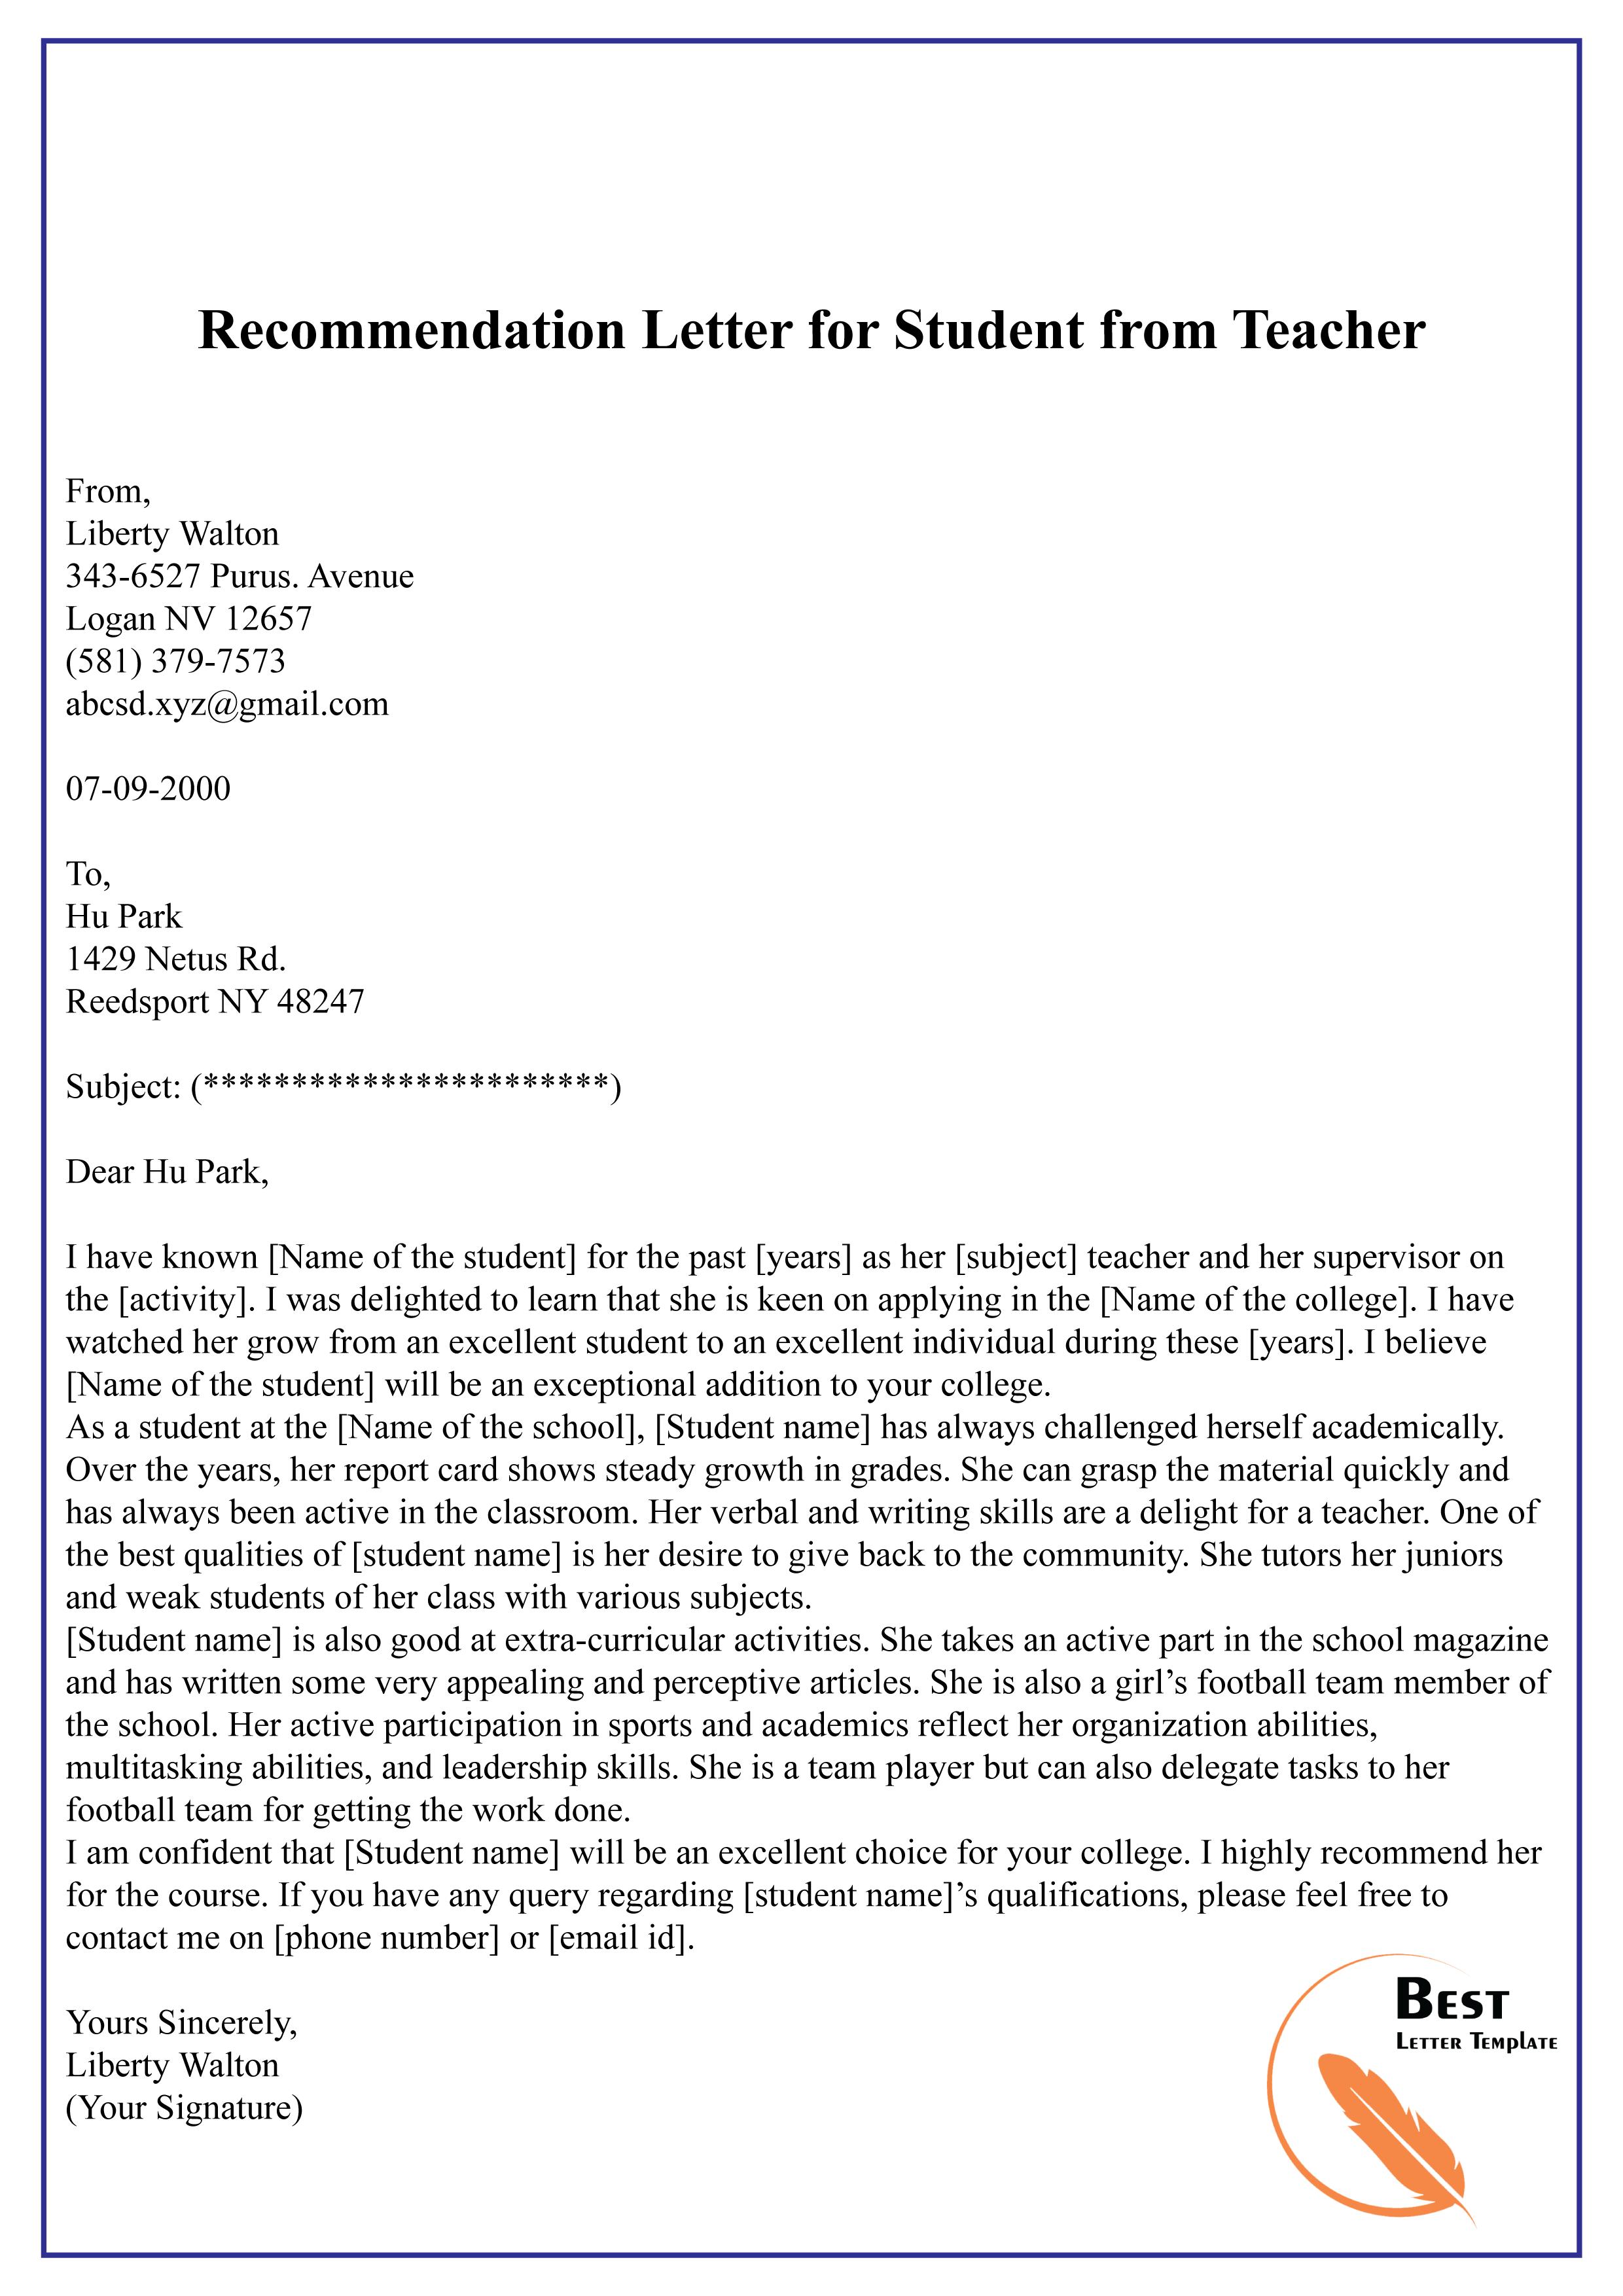 Letter Of Recommendation Template Teacher from bestlettertemplate.com